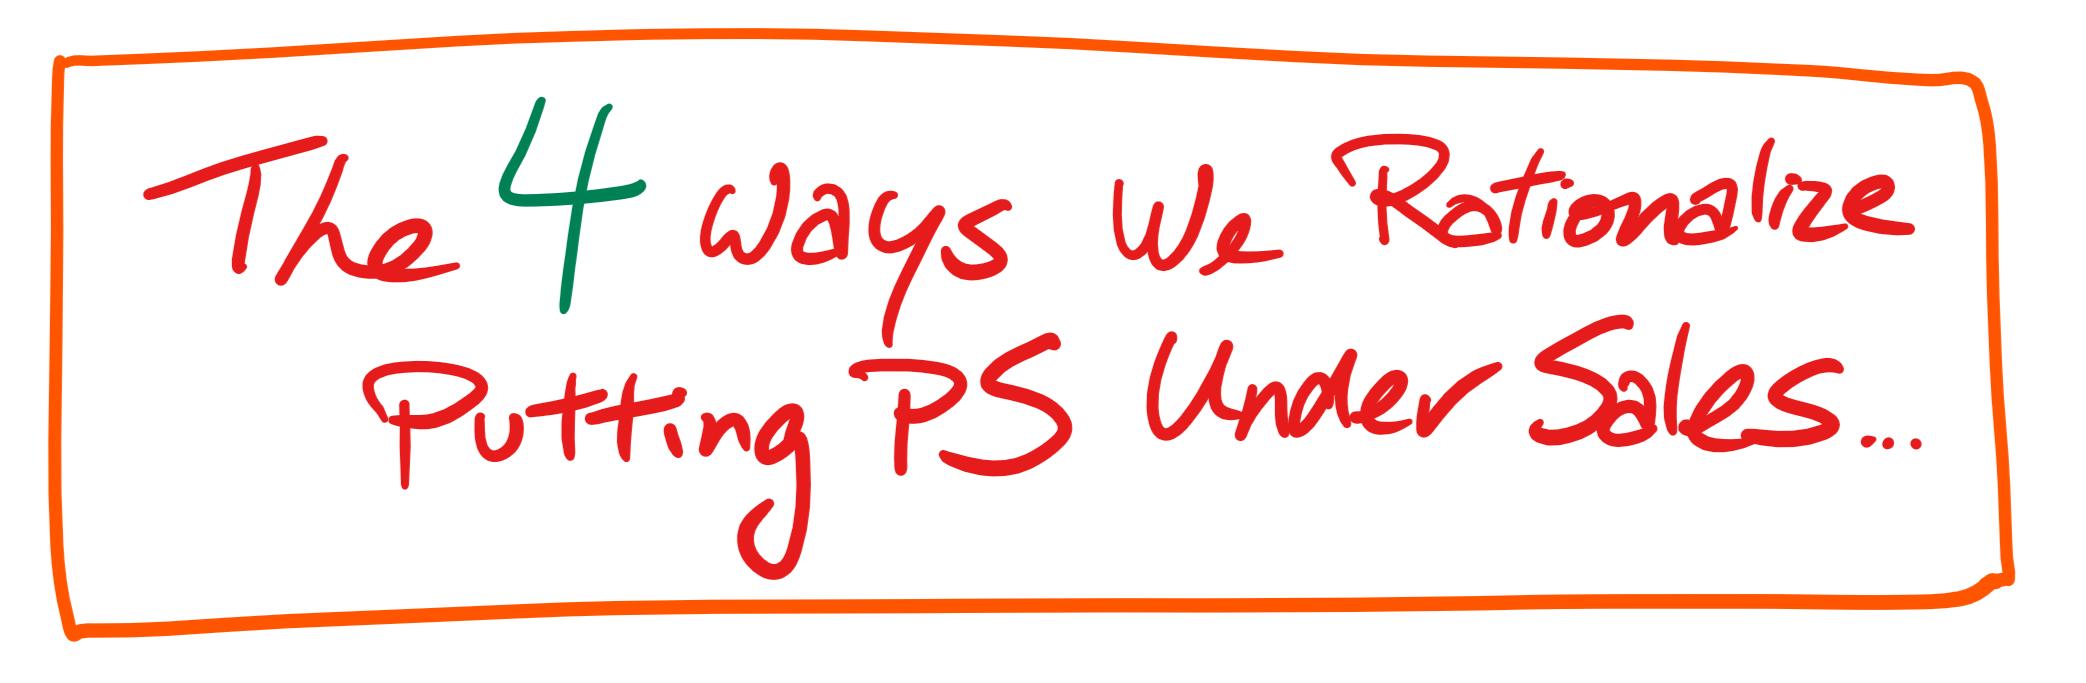 4 ways we rationalize Ps under sales.png